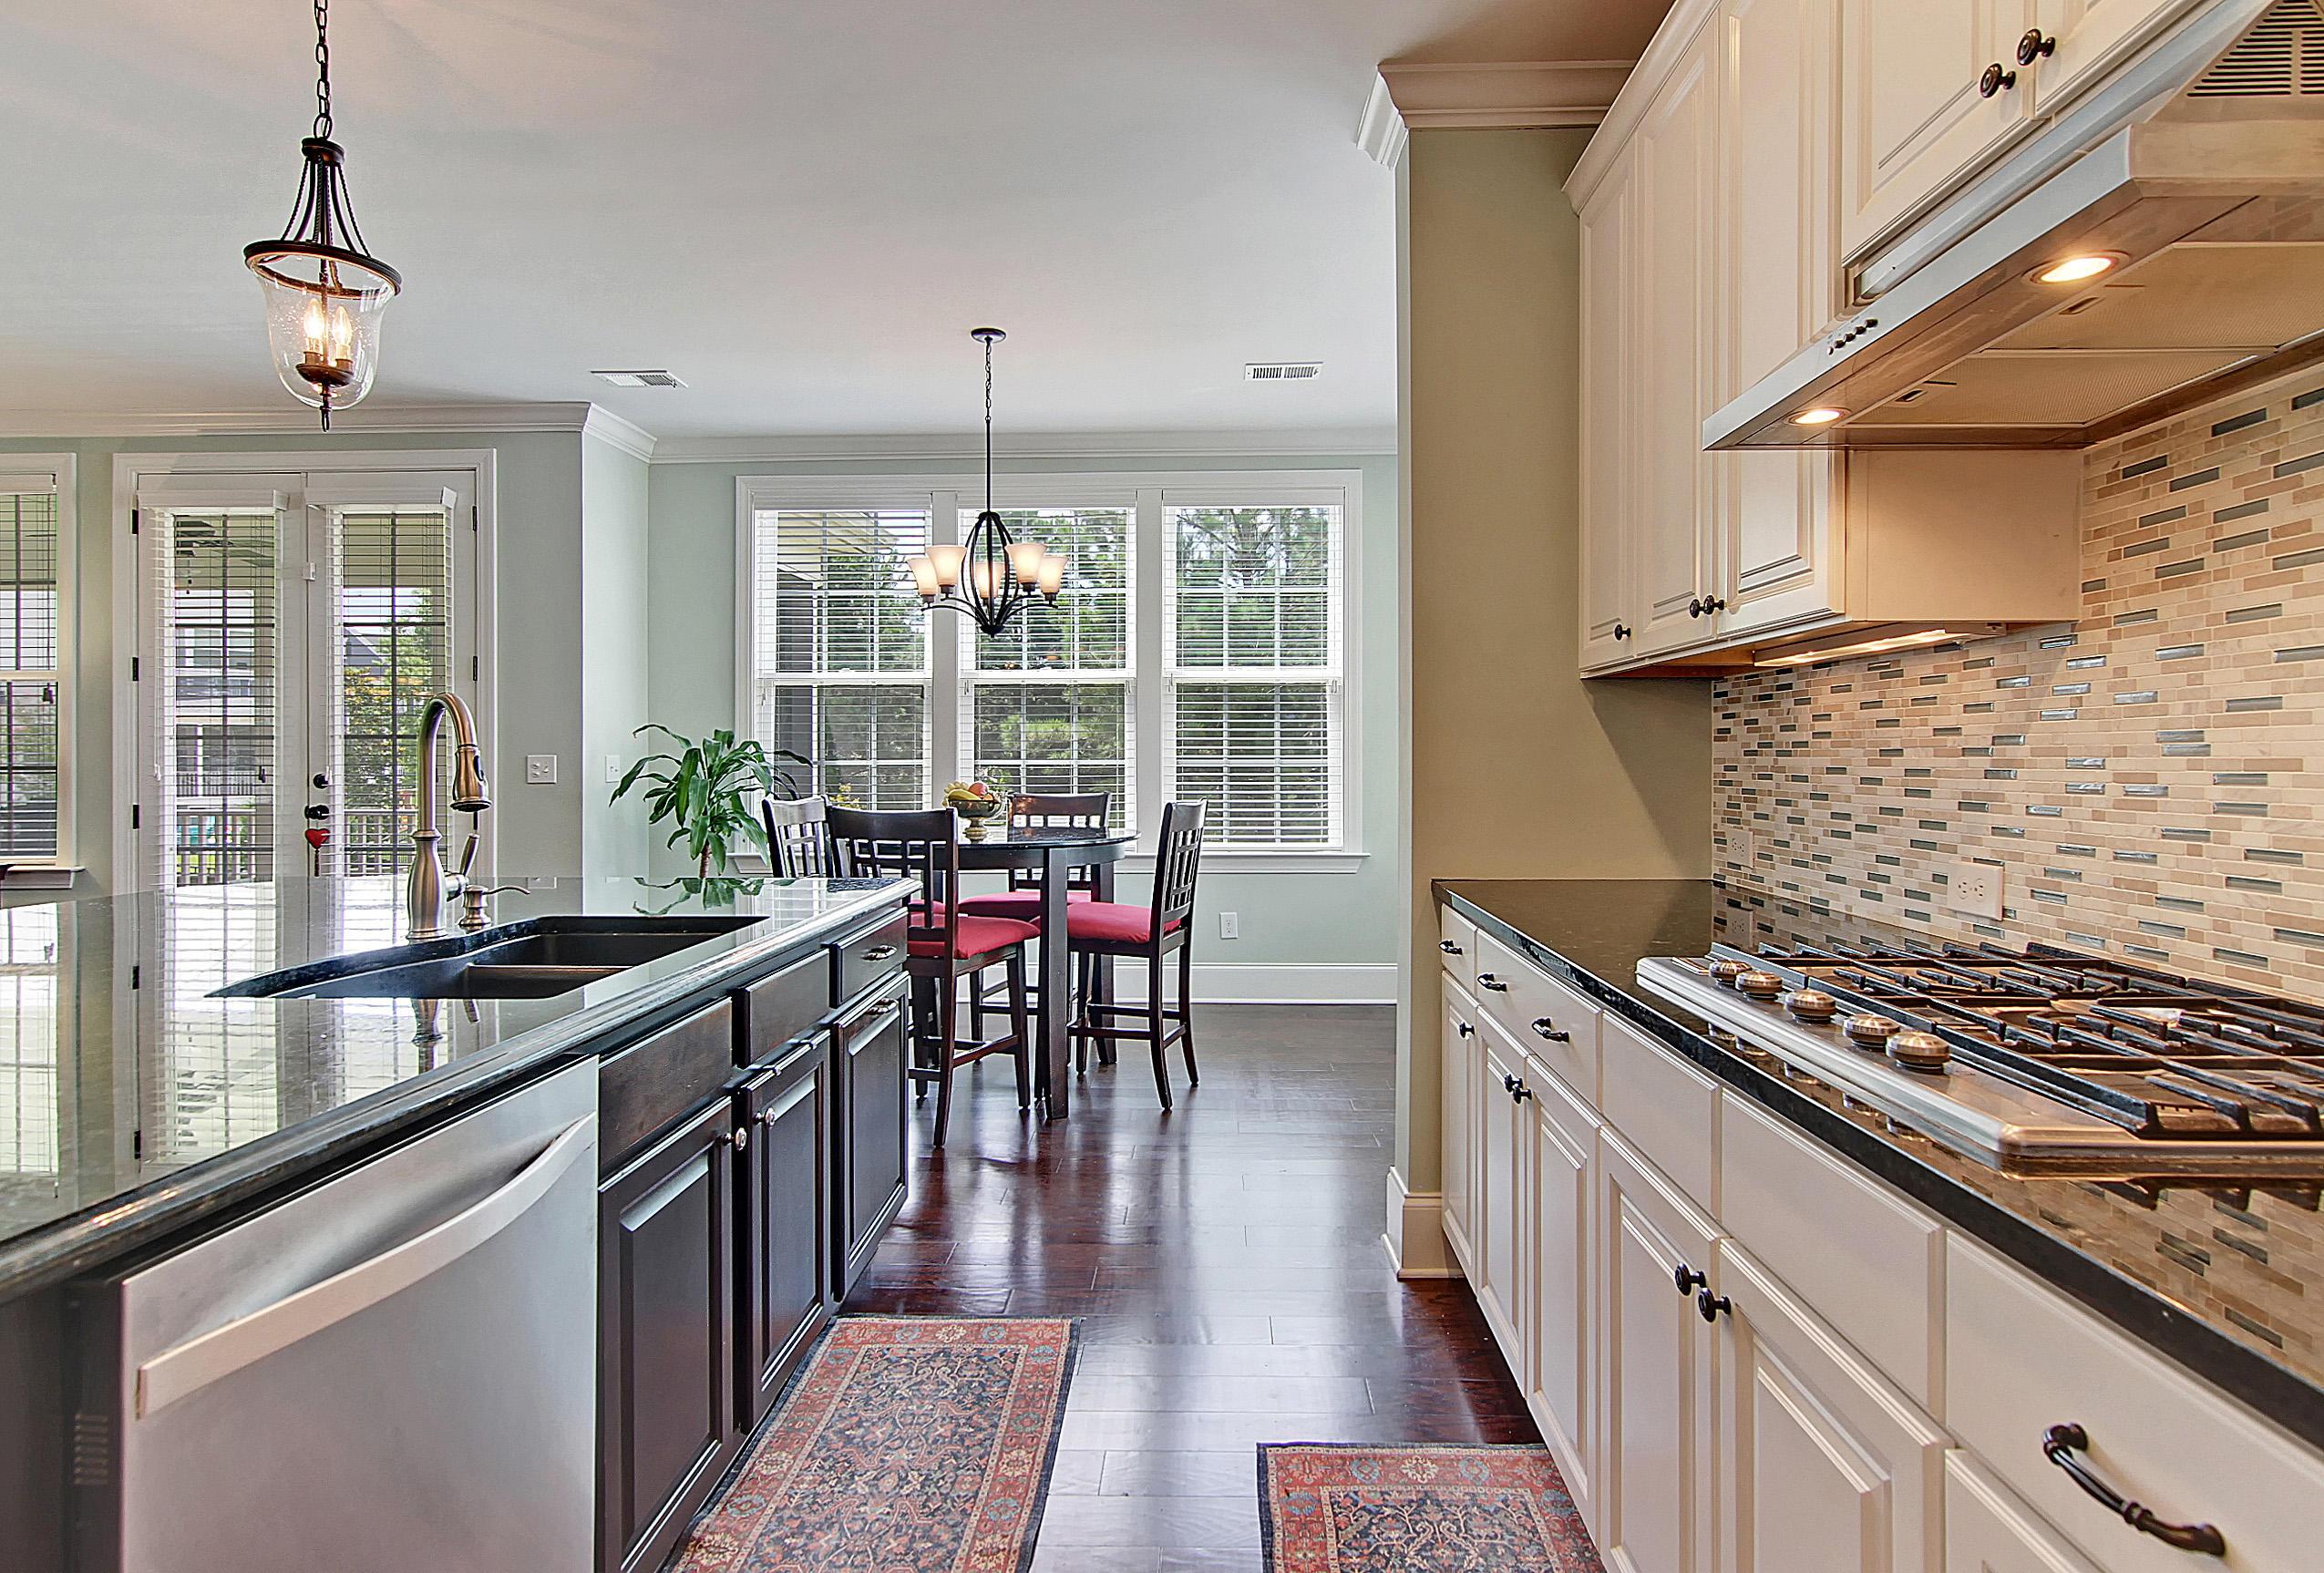 Dunes West Homes For Sale - 1332 Whisker Pole, Mount Pleasant, SC - 15